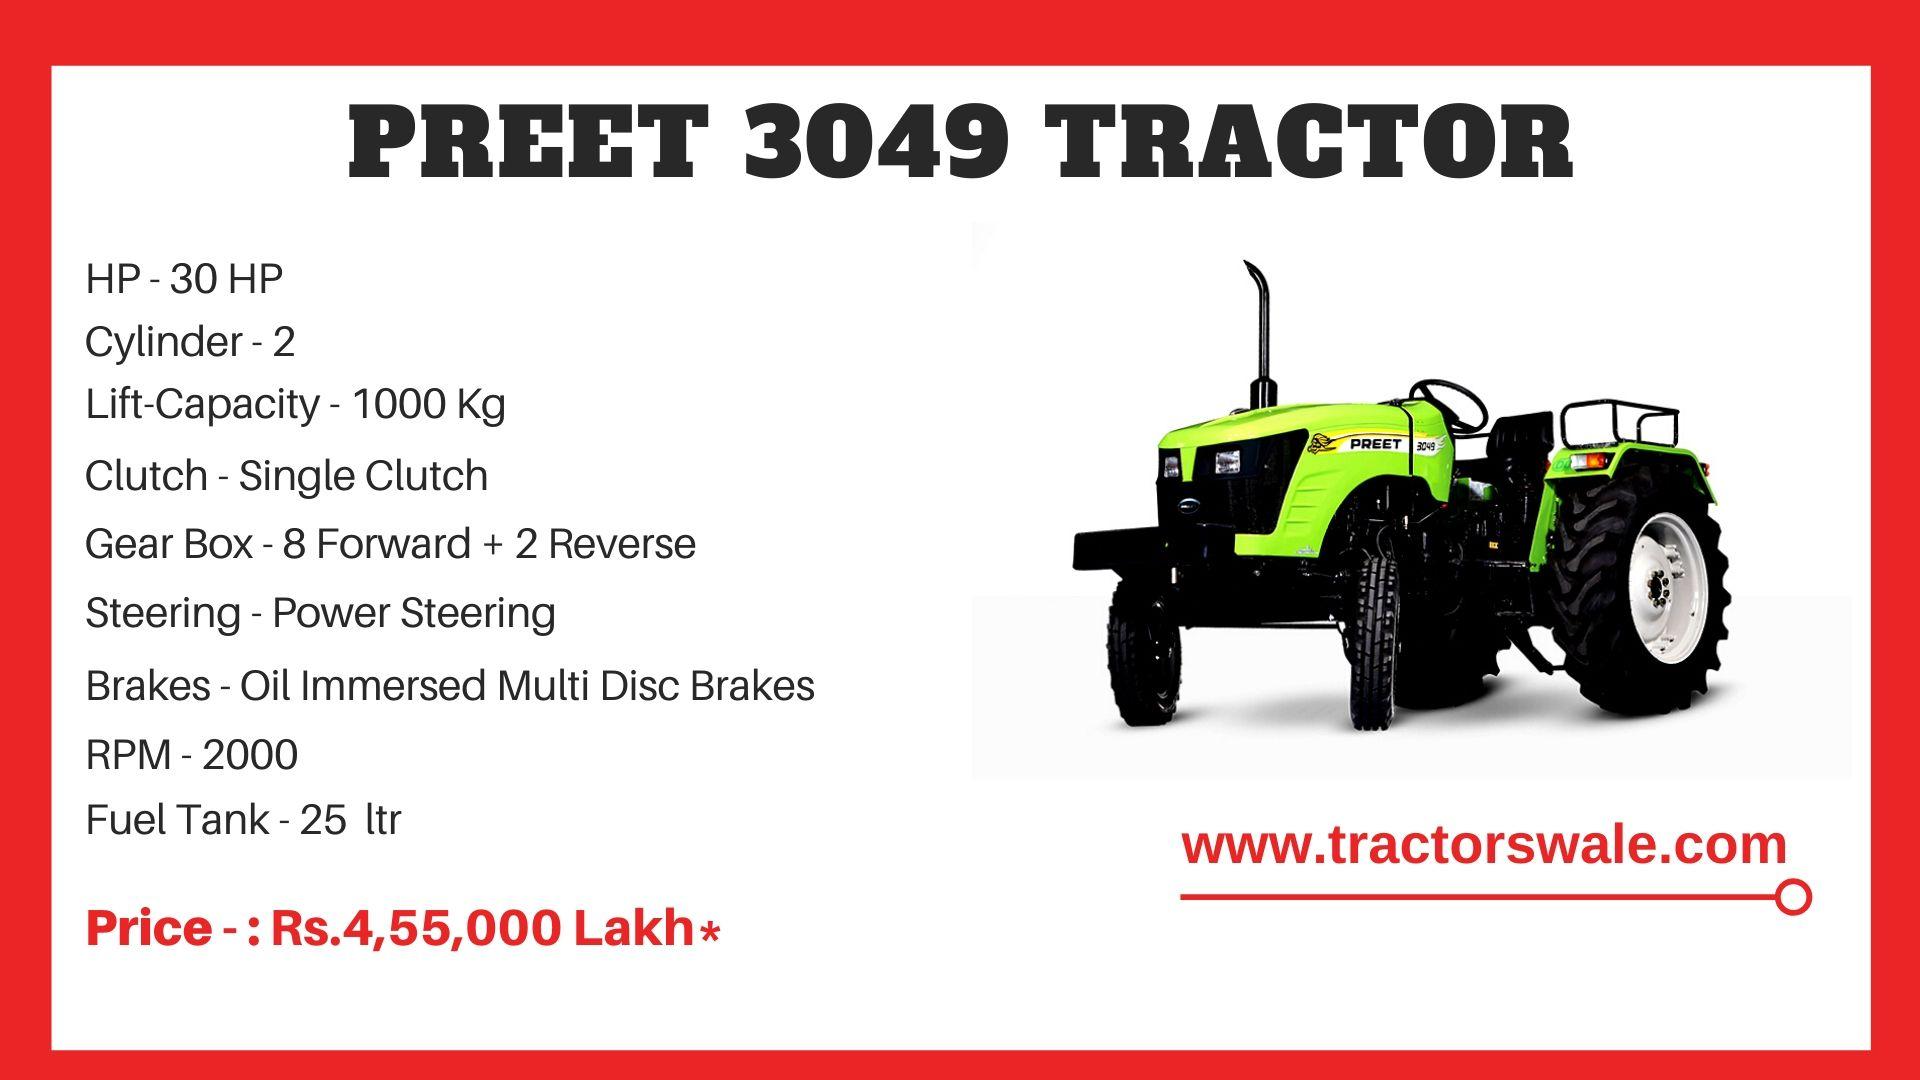 Preet 3049 tractor price